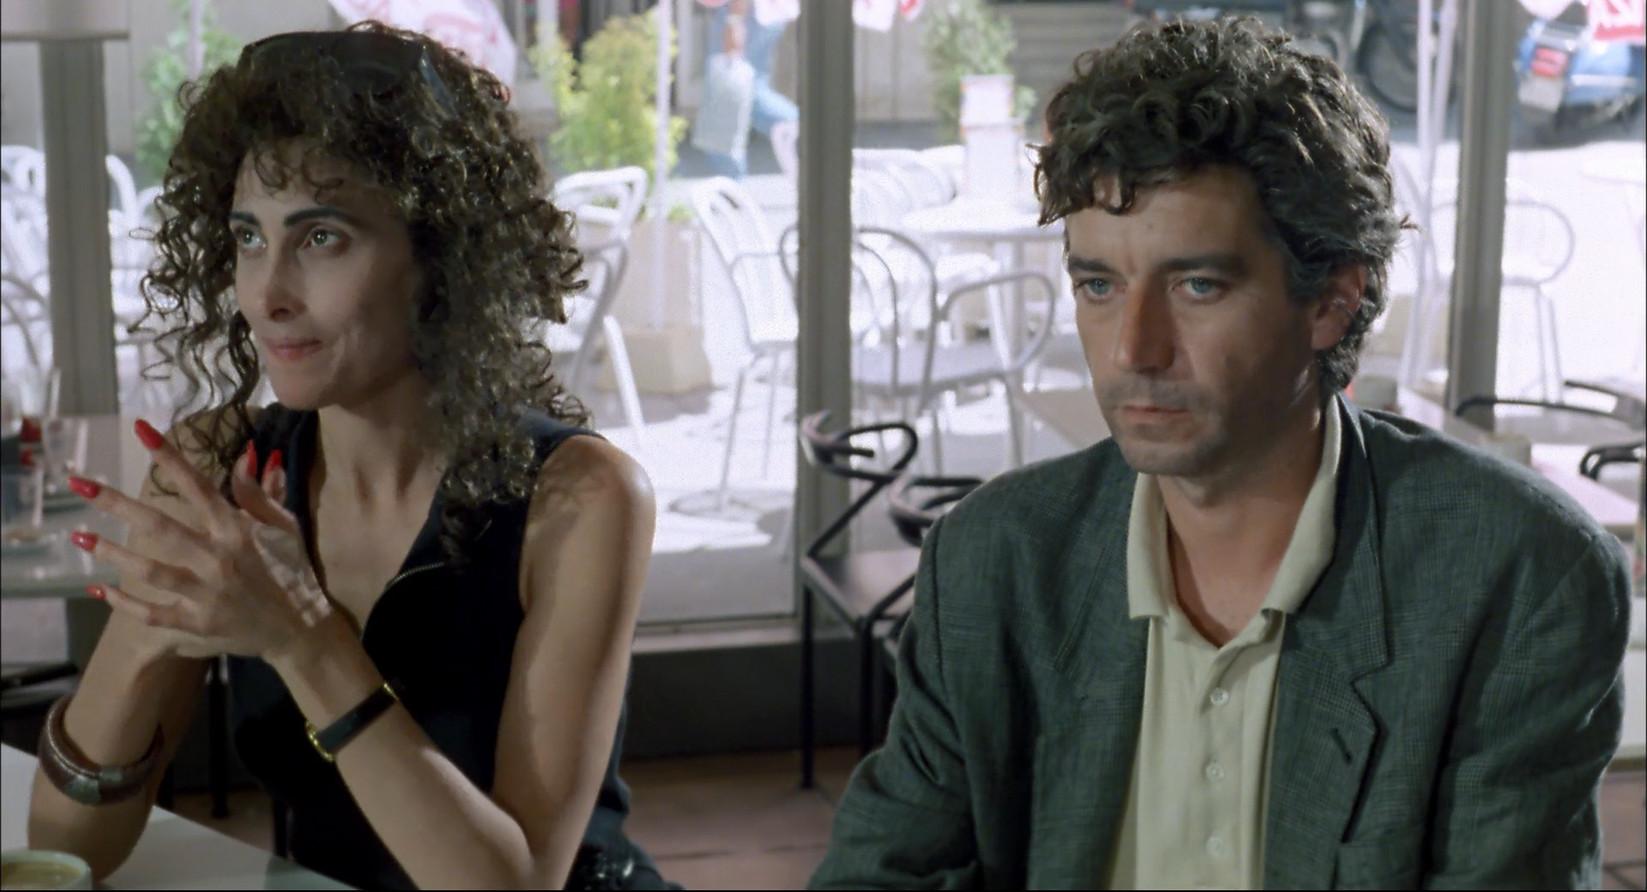 jb23R8 - Las edades de Lulú | 1990 | Drama. Erótico | BDrip 1080p | castellano DTS 5.1 | 11 GB